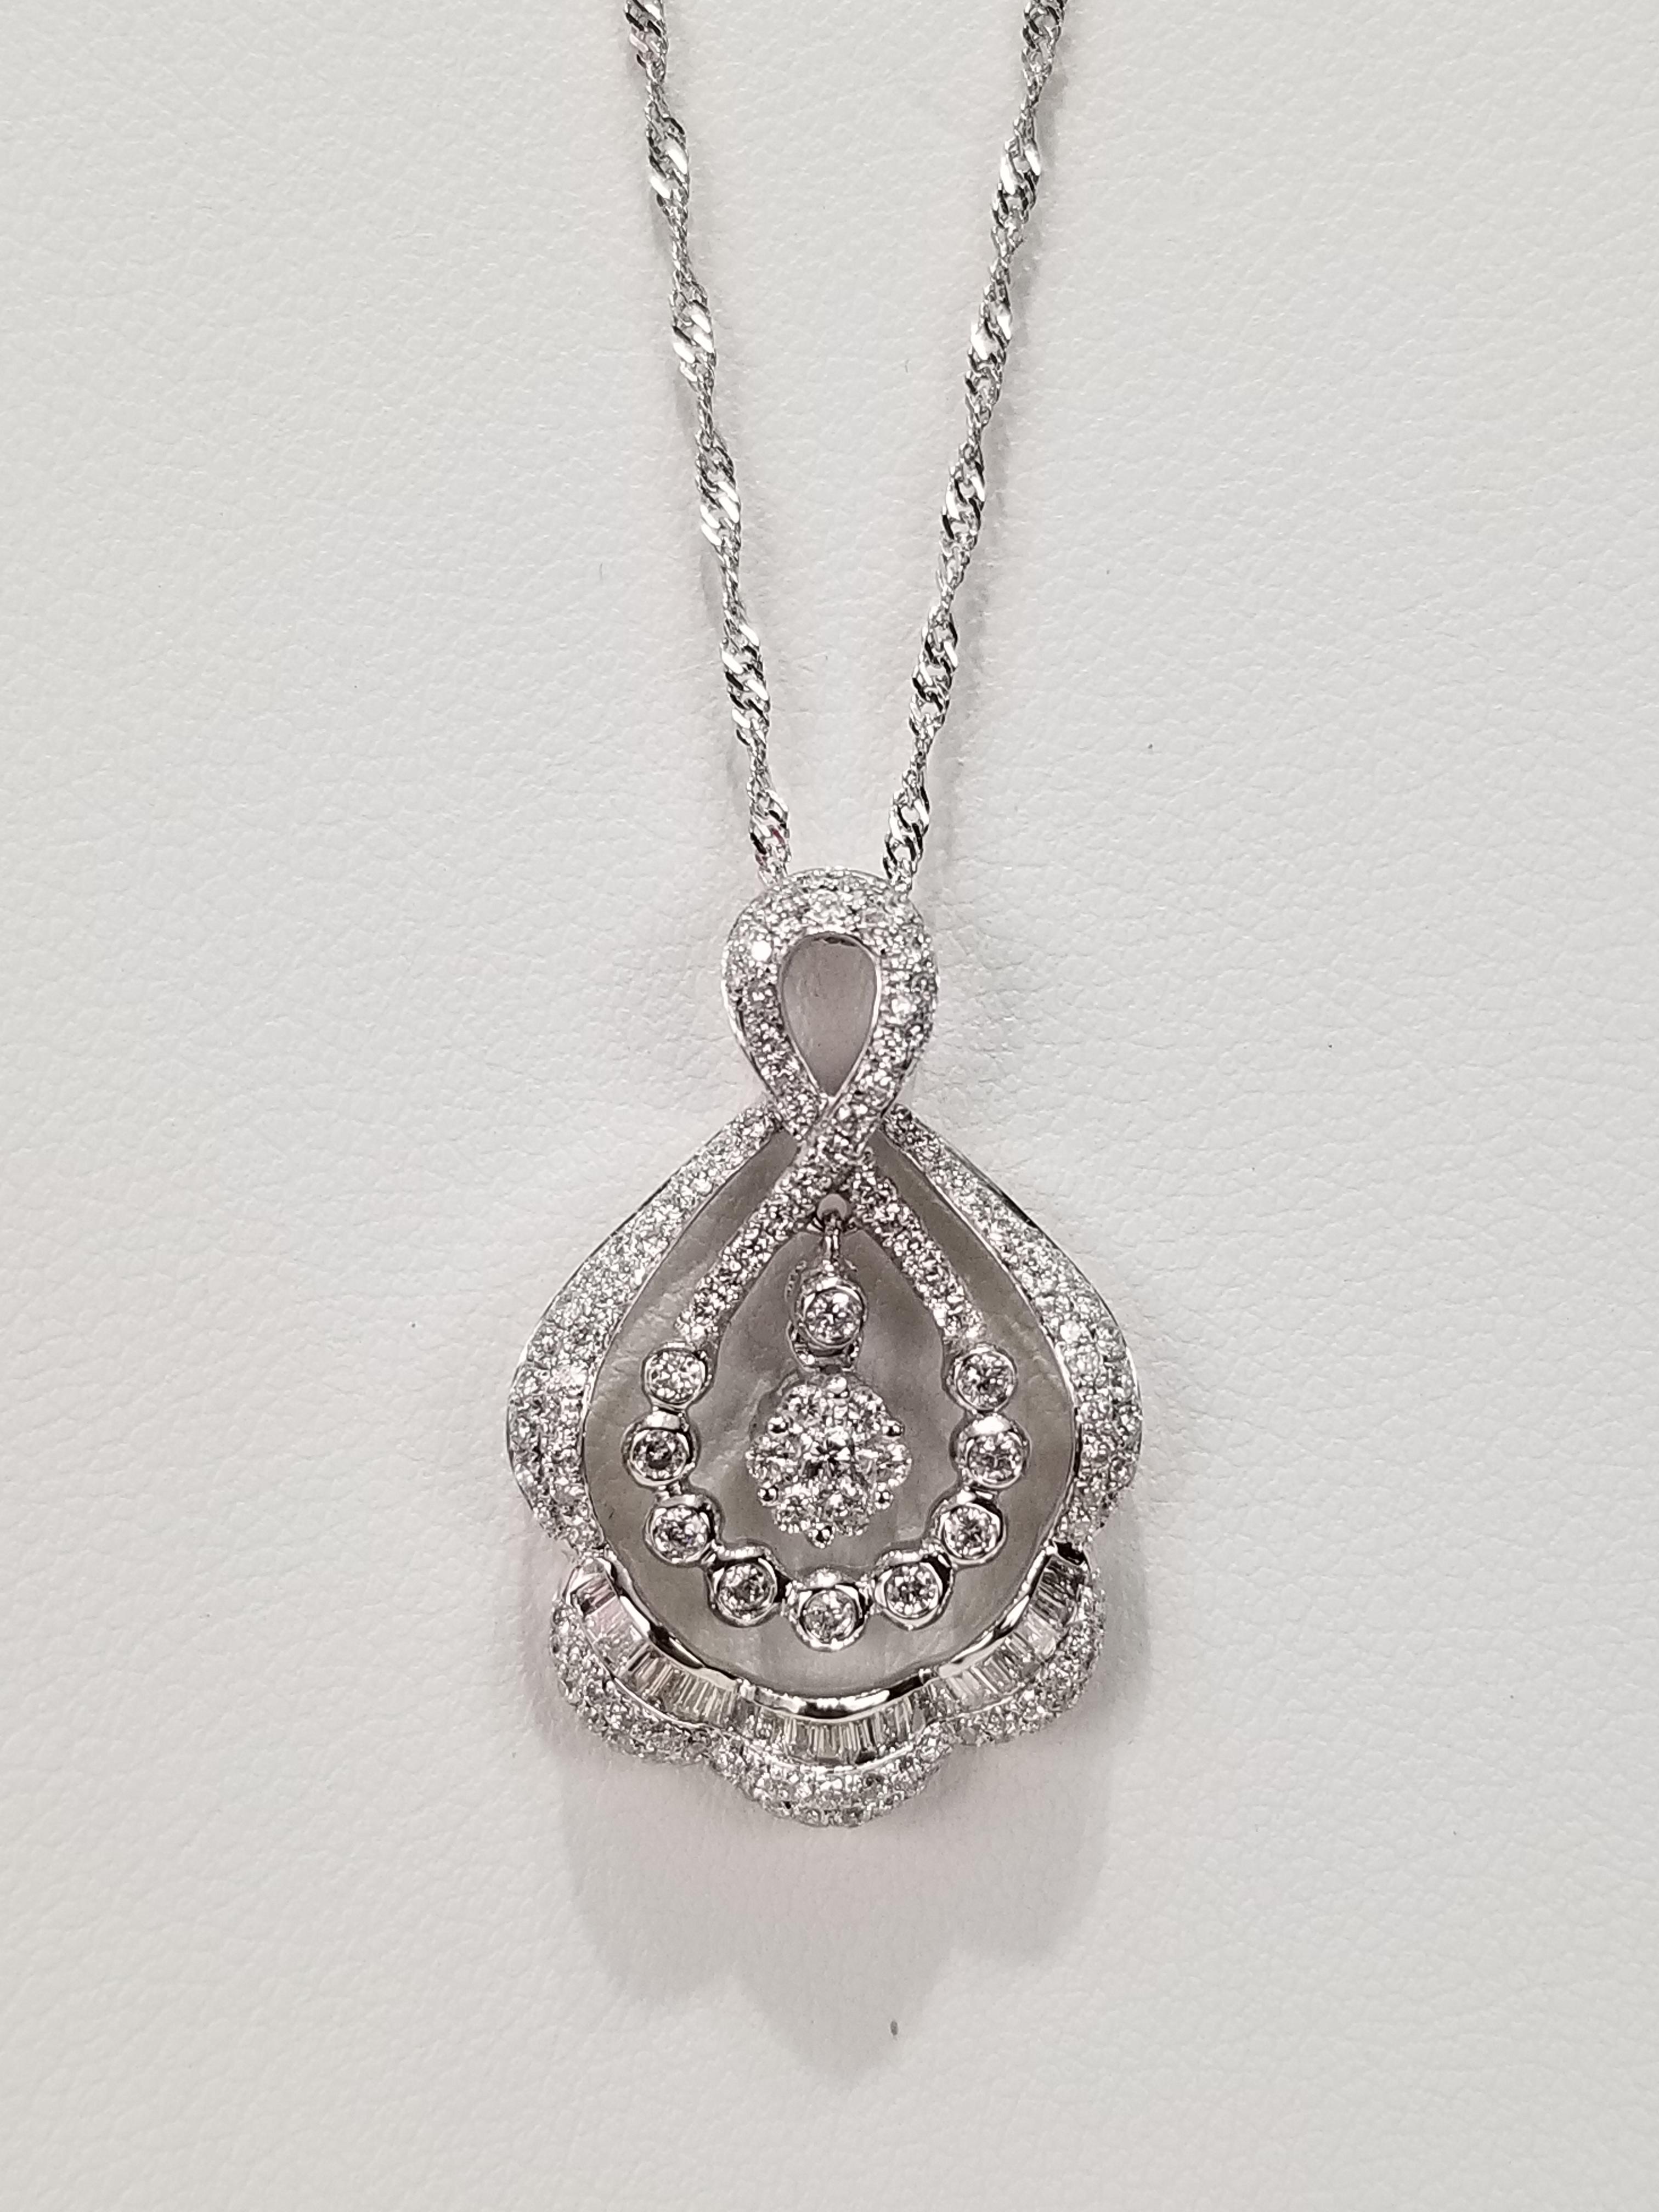 14K White Gold Diamonds 0.88ct Regular Price $3750 SALE $1025 Ref HM645